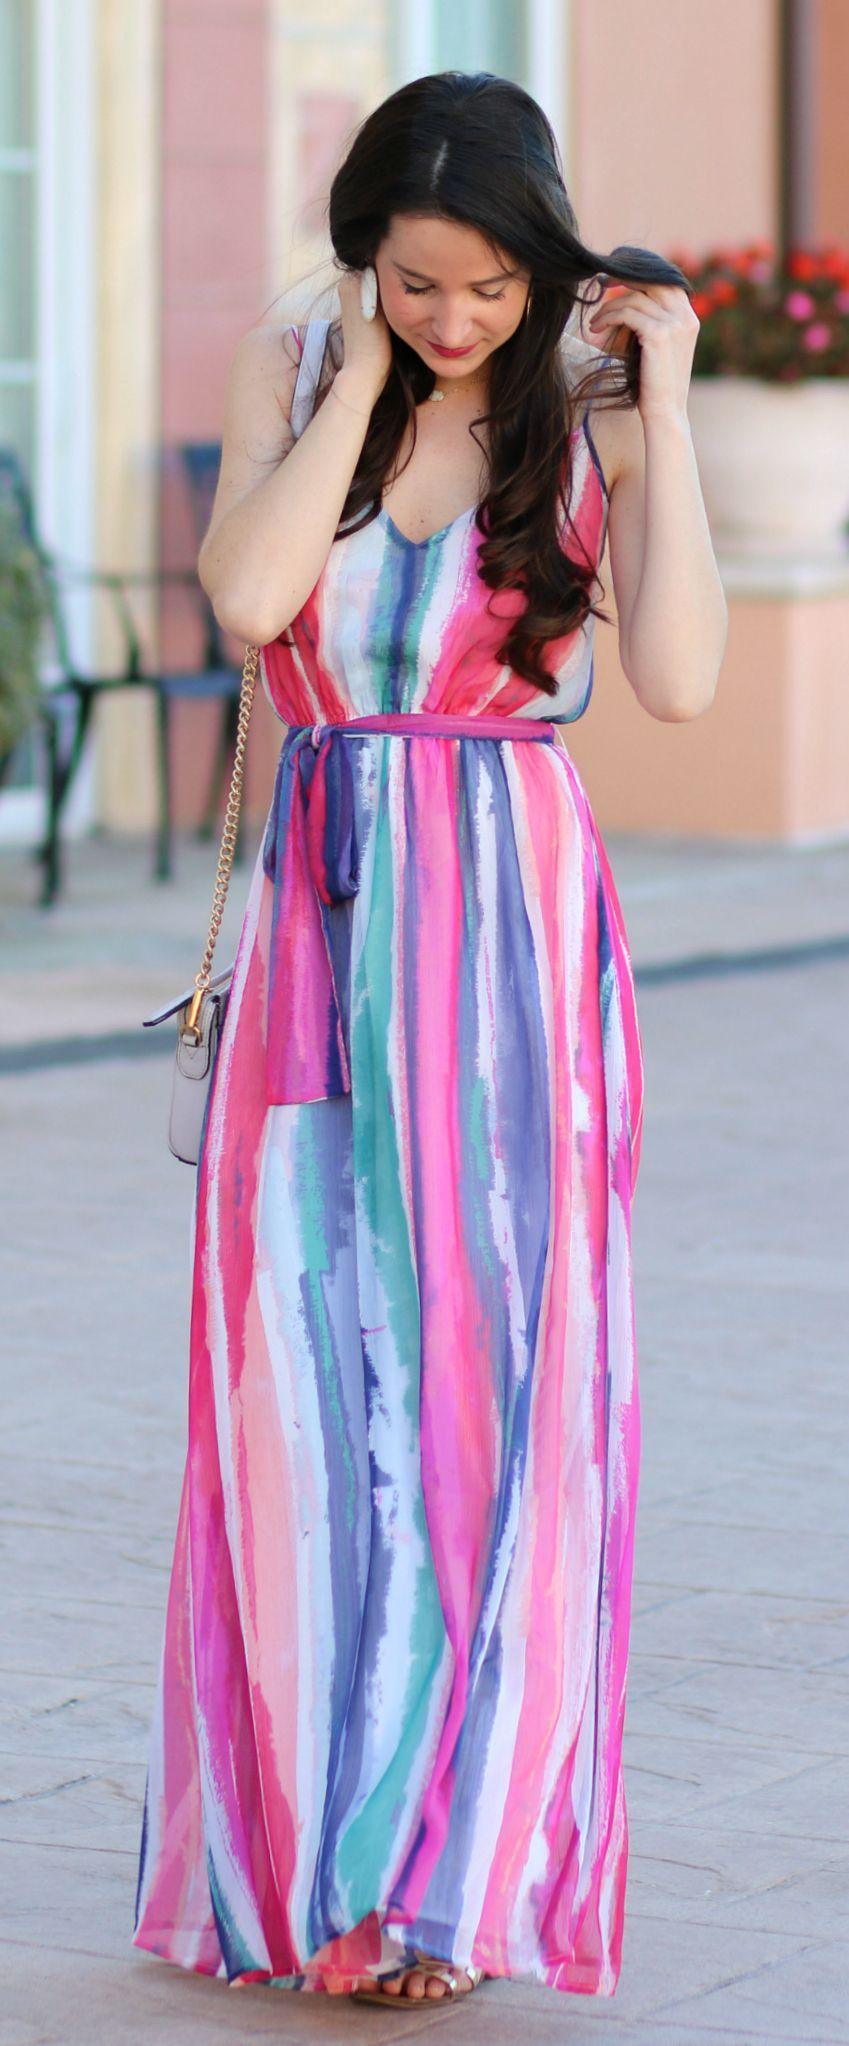 Colorful Spring Maxi Dress from Jack by BB Dakota | Vestidos maxi ...